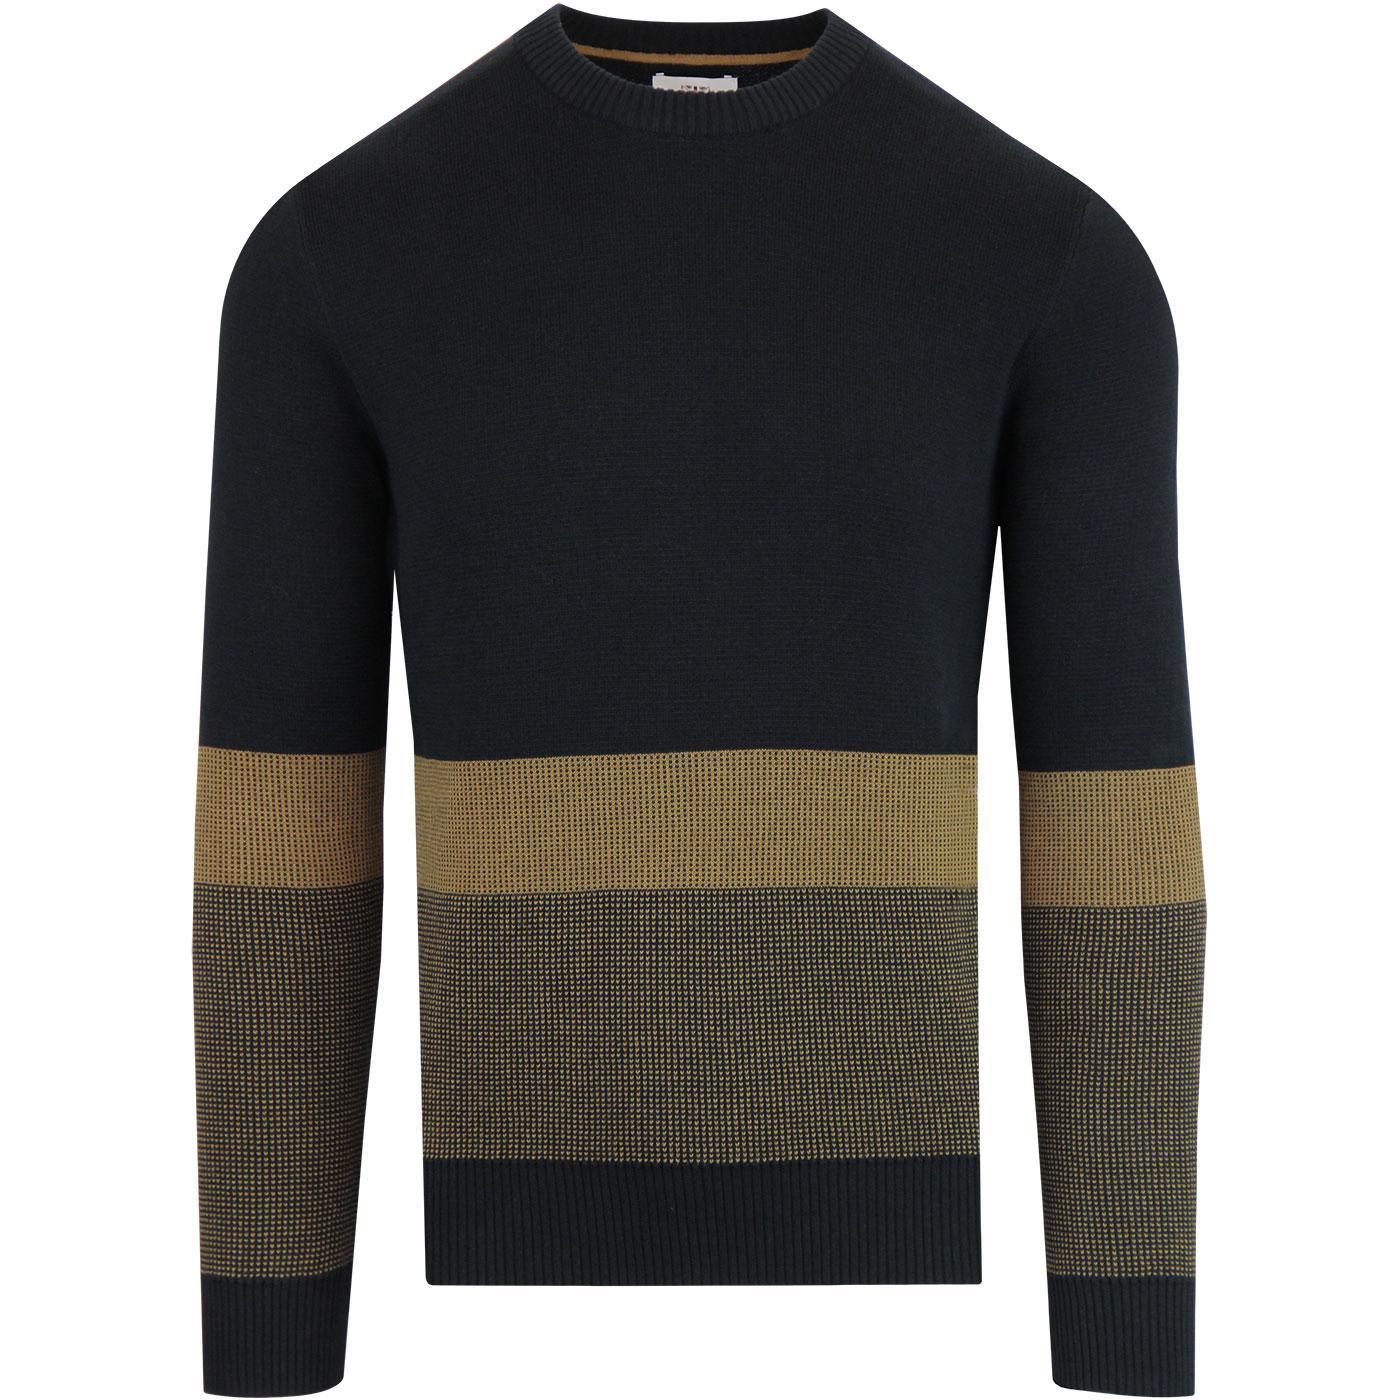 BEN SHERMAN Birdseye Colour Block Knitted Jumper